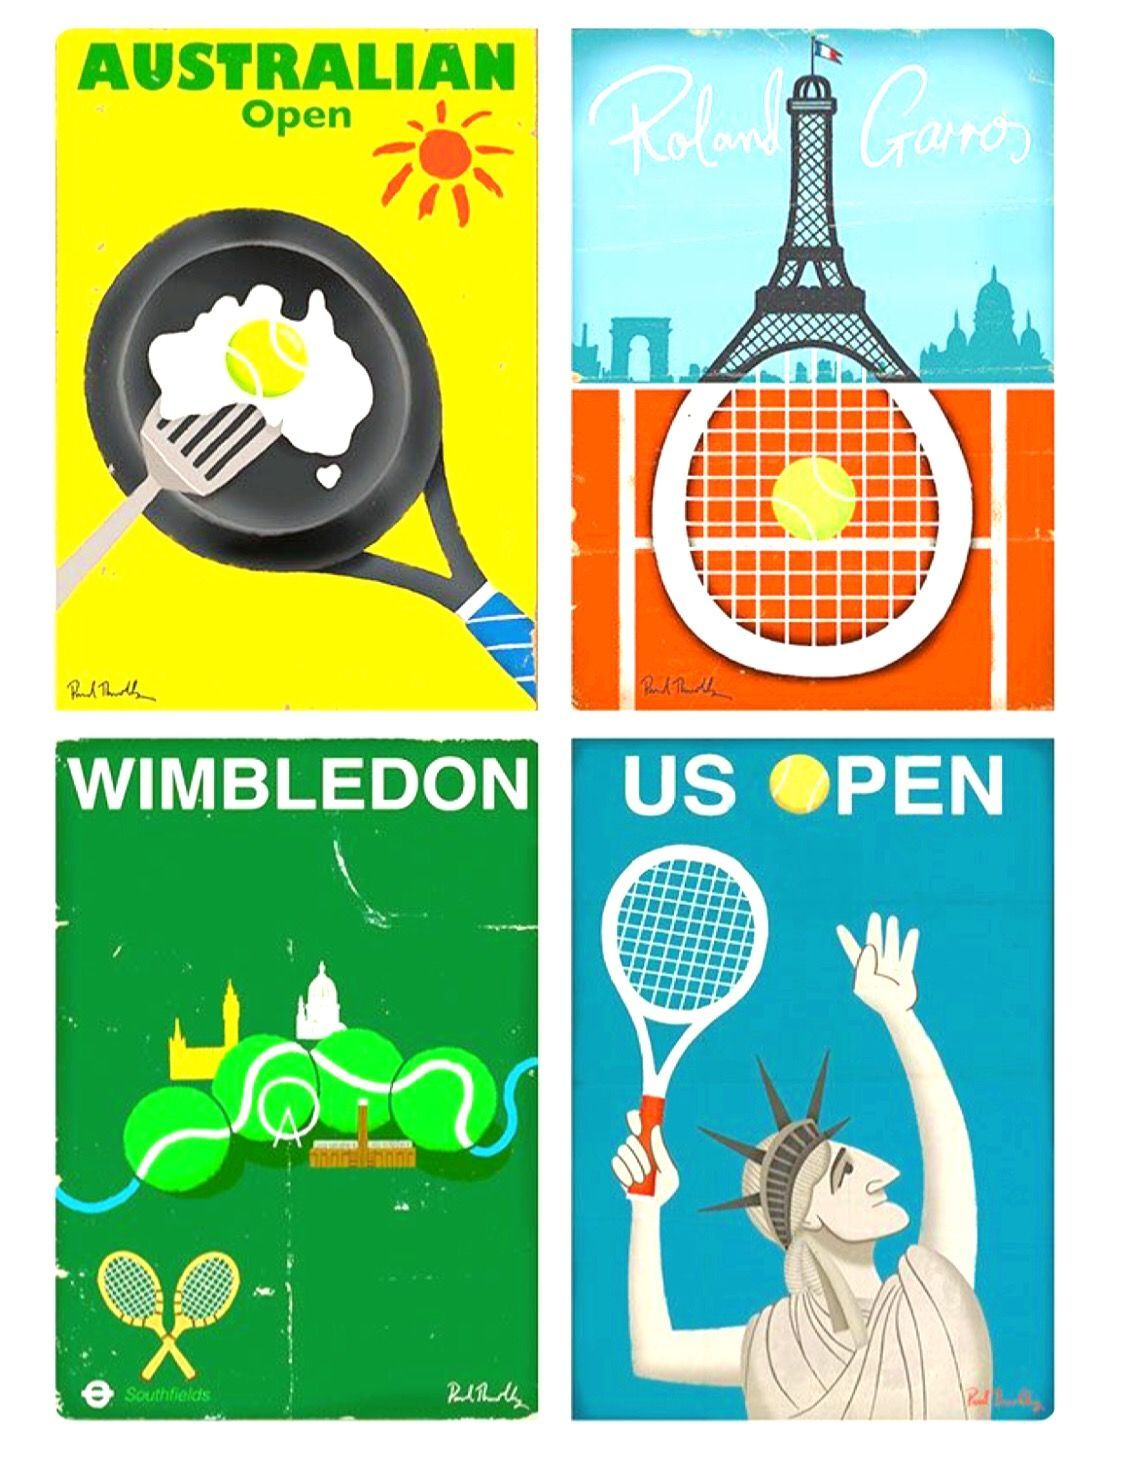 The Four Tennis Grand Slams Tennis Tennis Art Tennis Photography